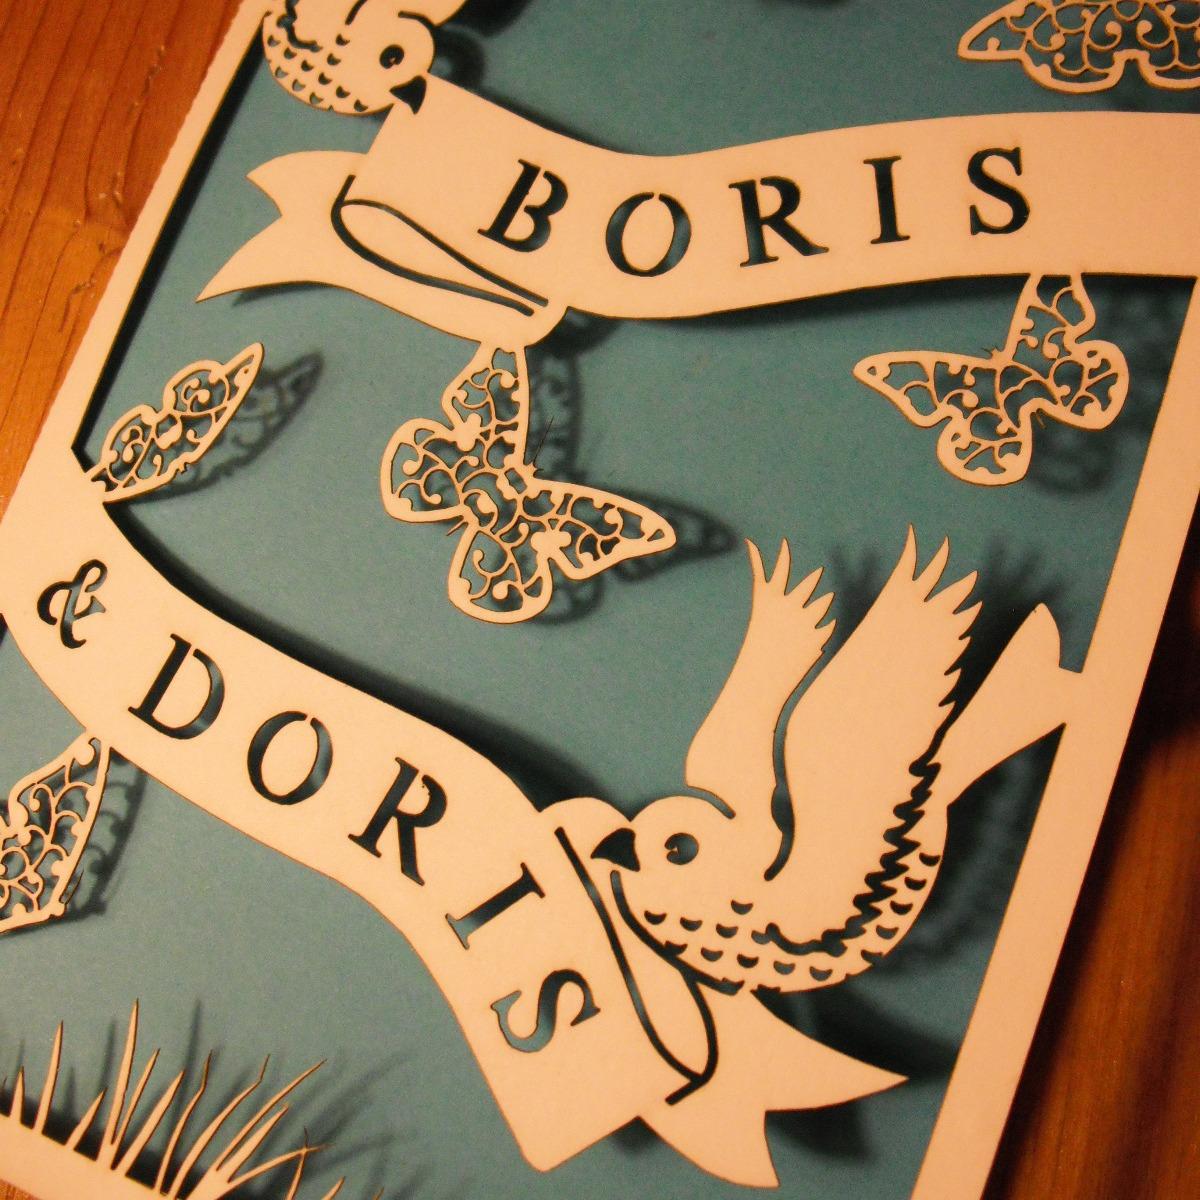 Boris and doris wedding